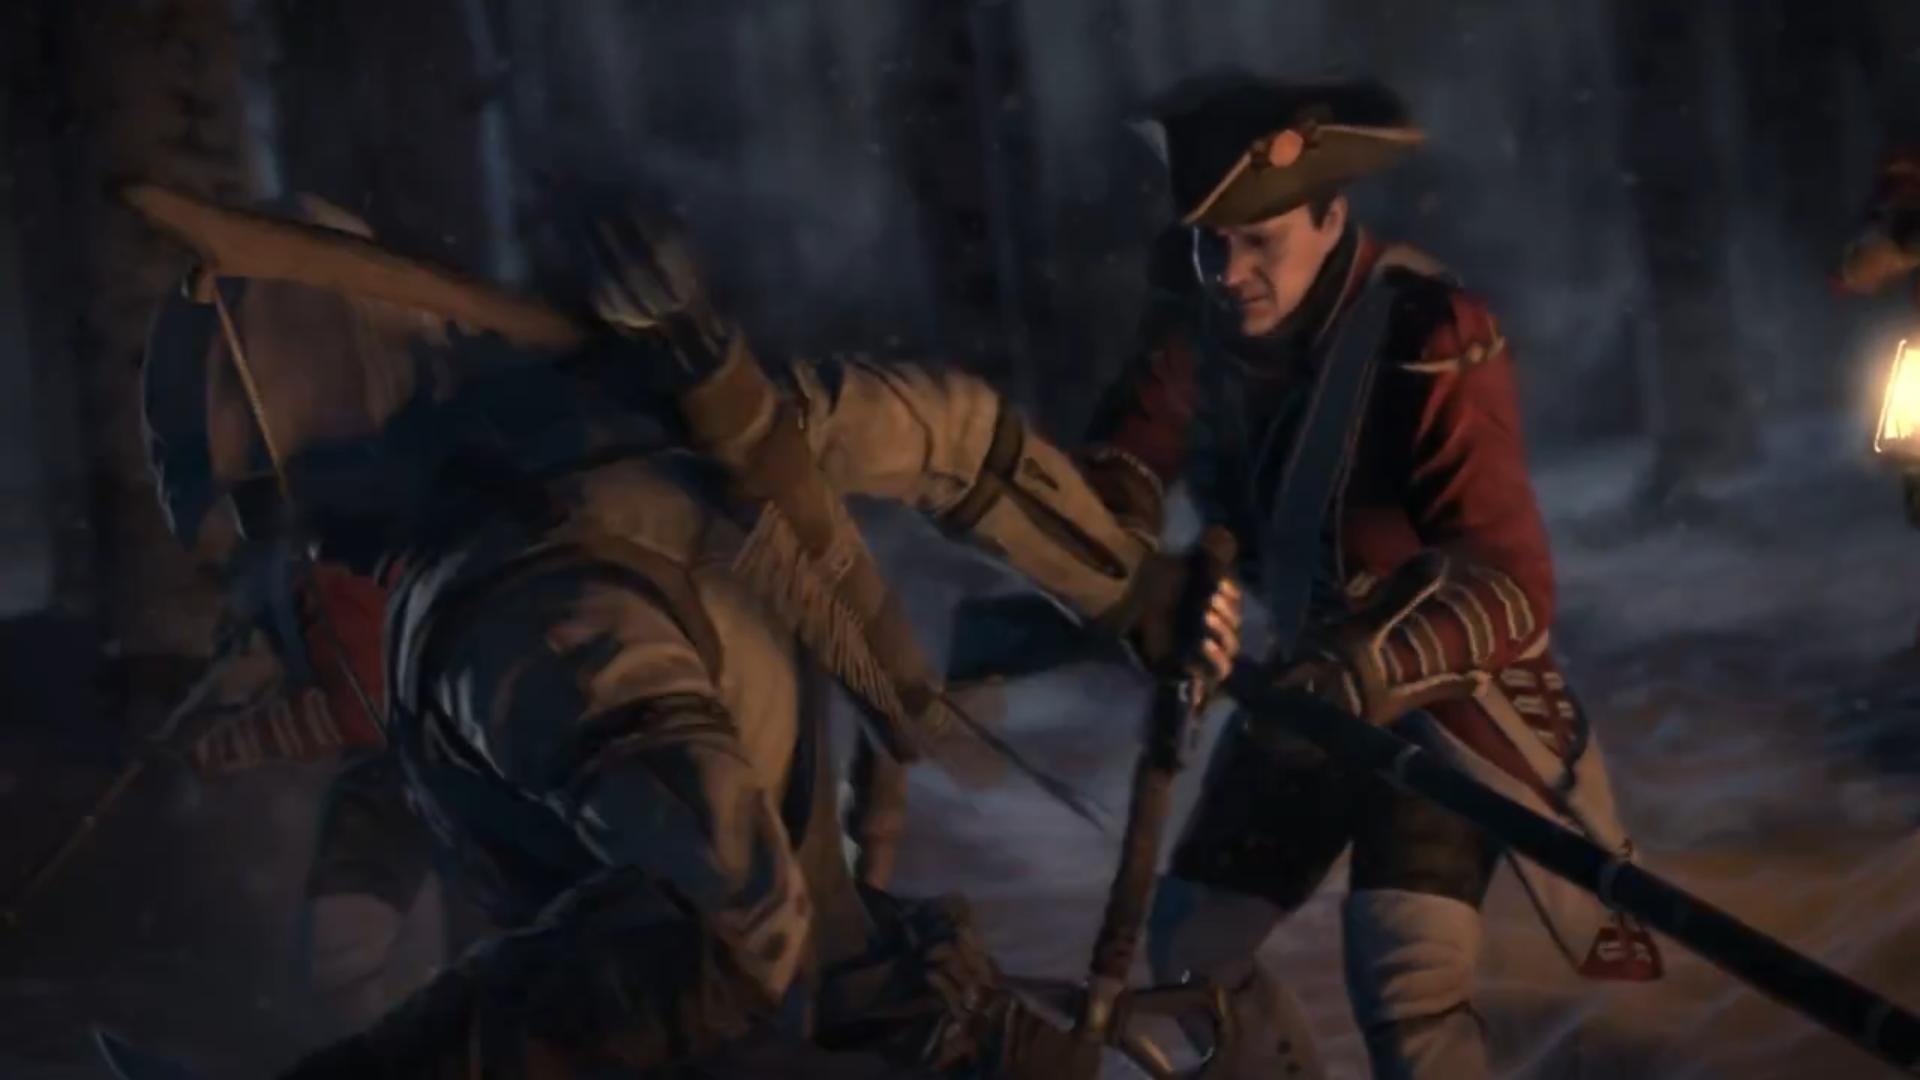 Assassin's Creed 3 - Rozbor prvního traileru 61679